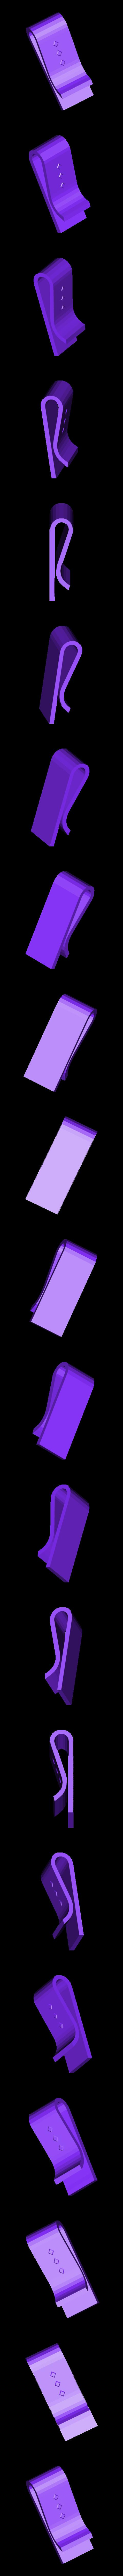 Money Clip.stl Download free STL file Money Clip • Model to 3D print, 3DBuilder